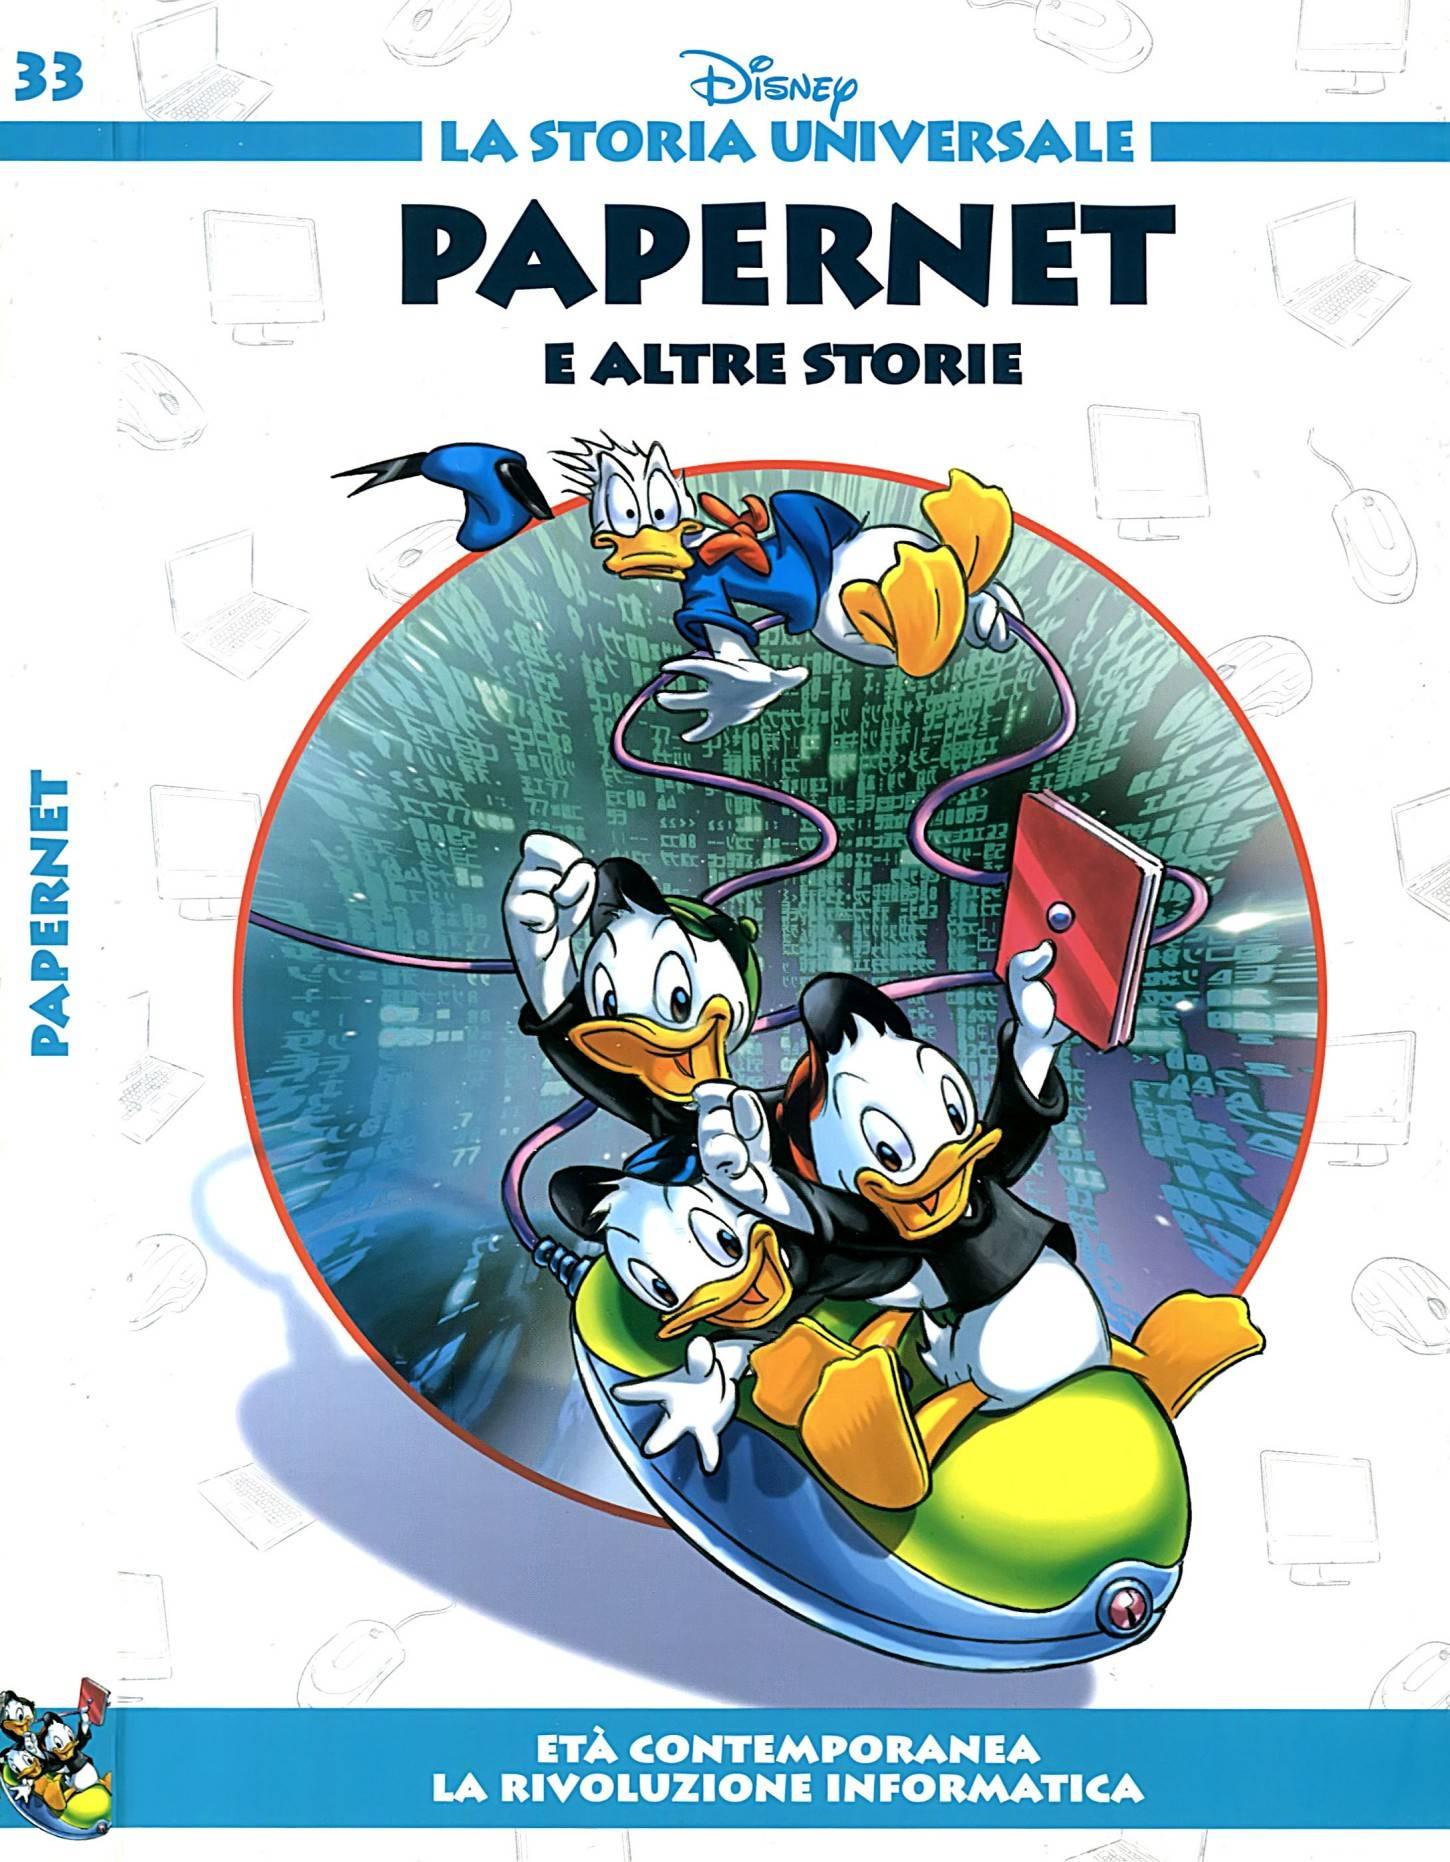 La Storia Universale Disney - Volume 33 - Papernet (2011)